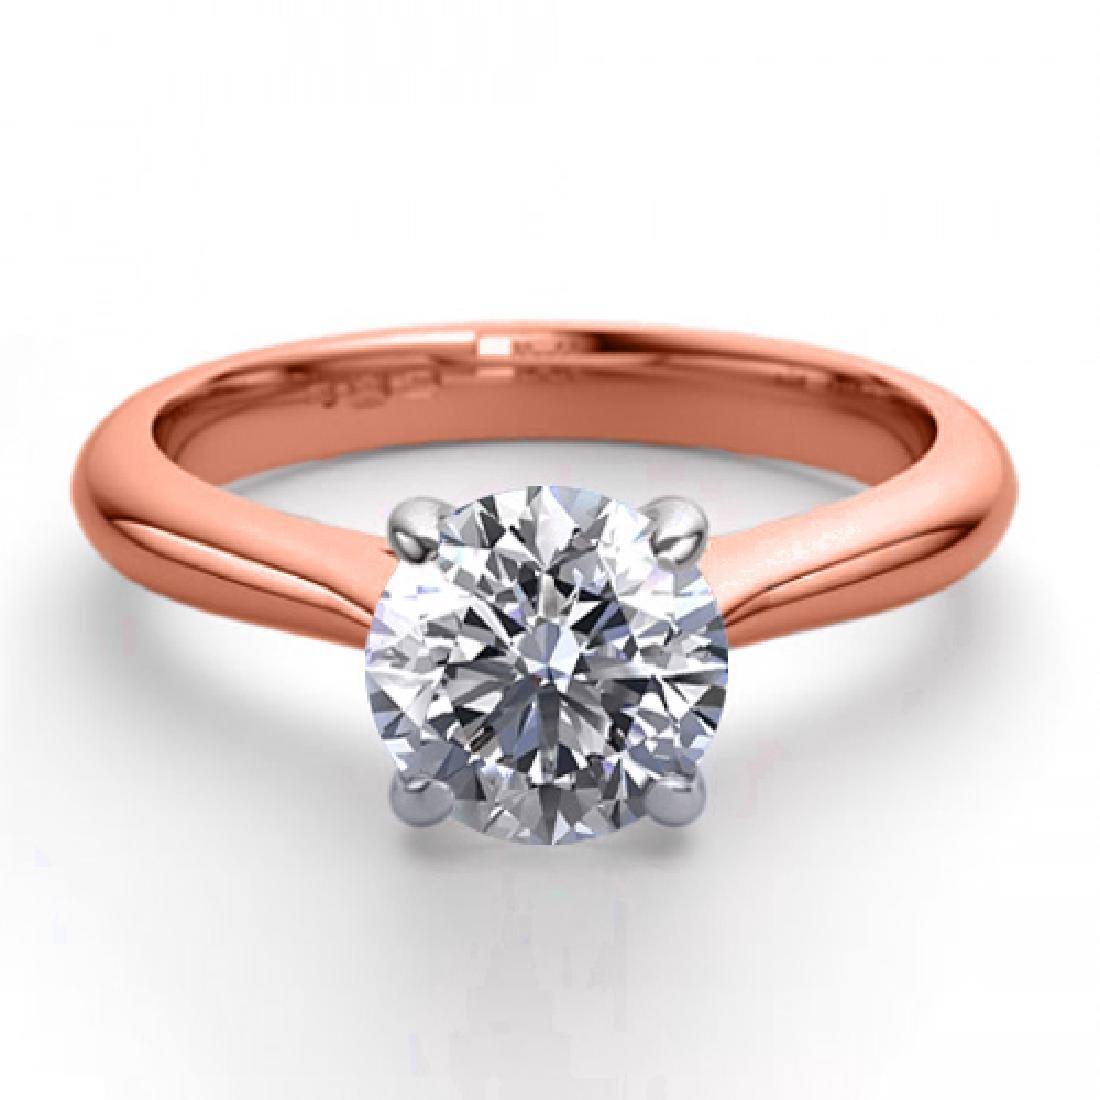 14K Rose Gold Jewelry 1.02 ctw Natural Diamond